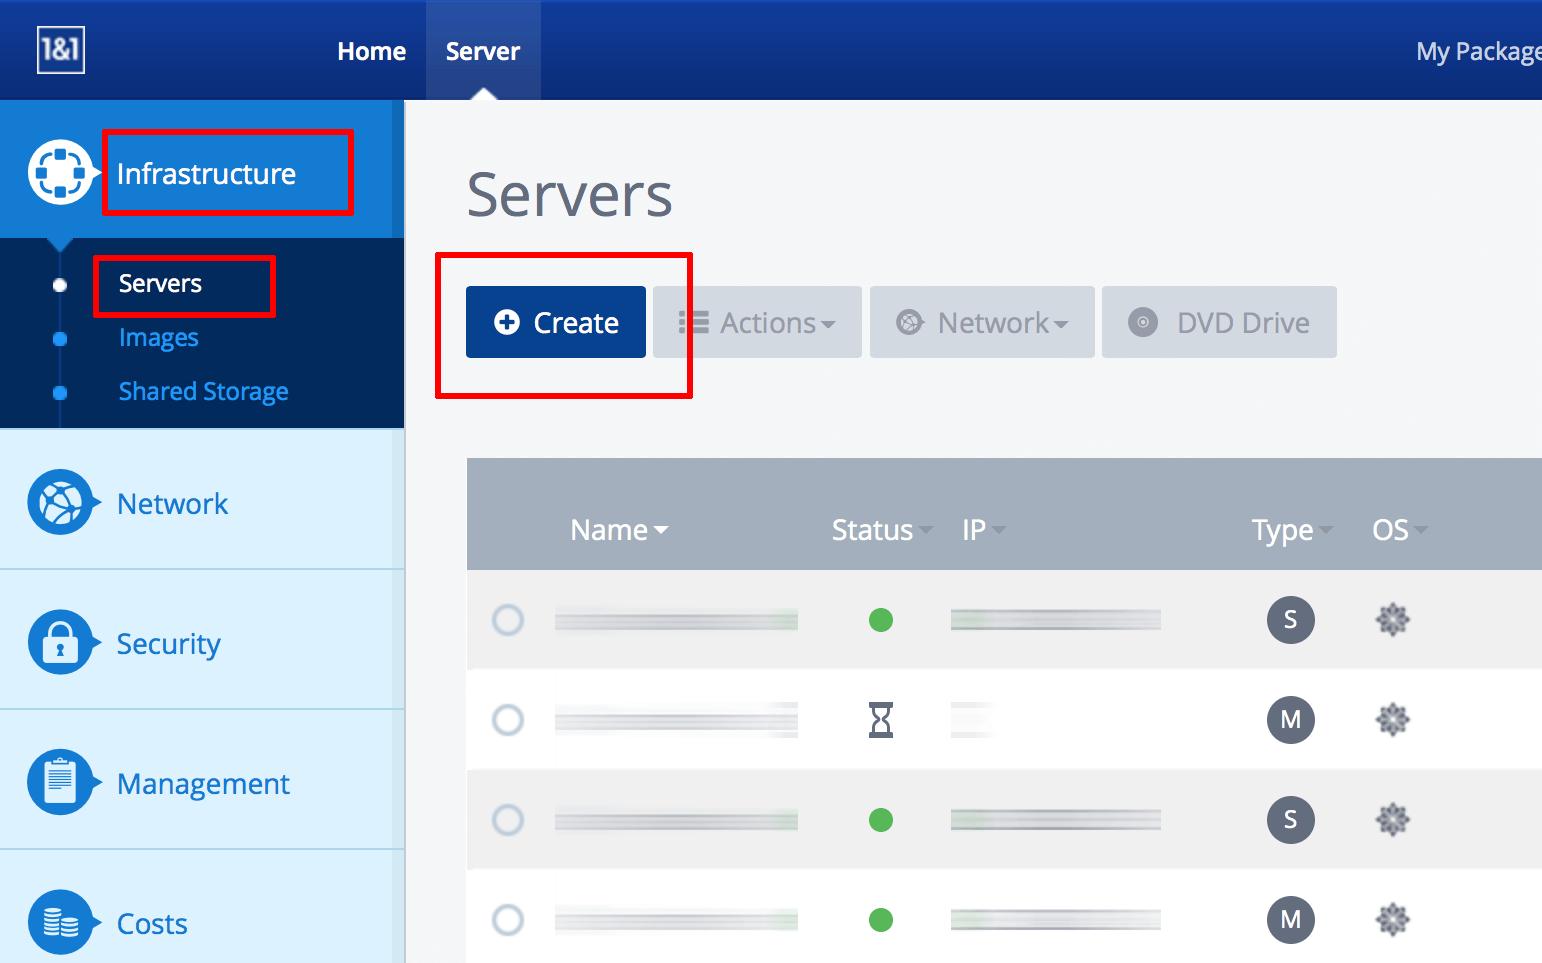 1&1 server creation